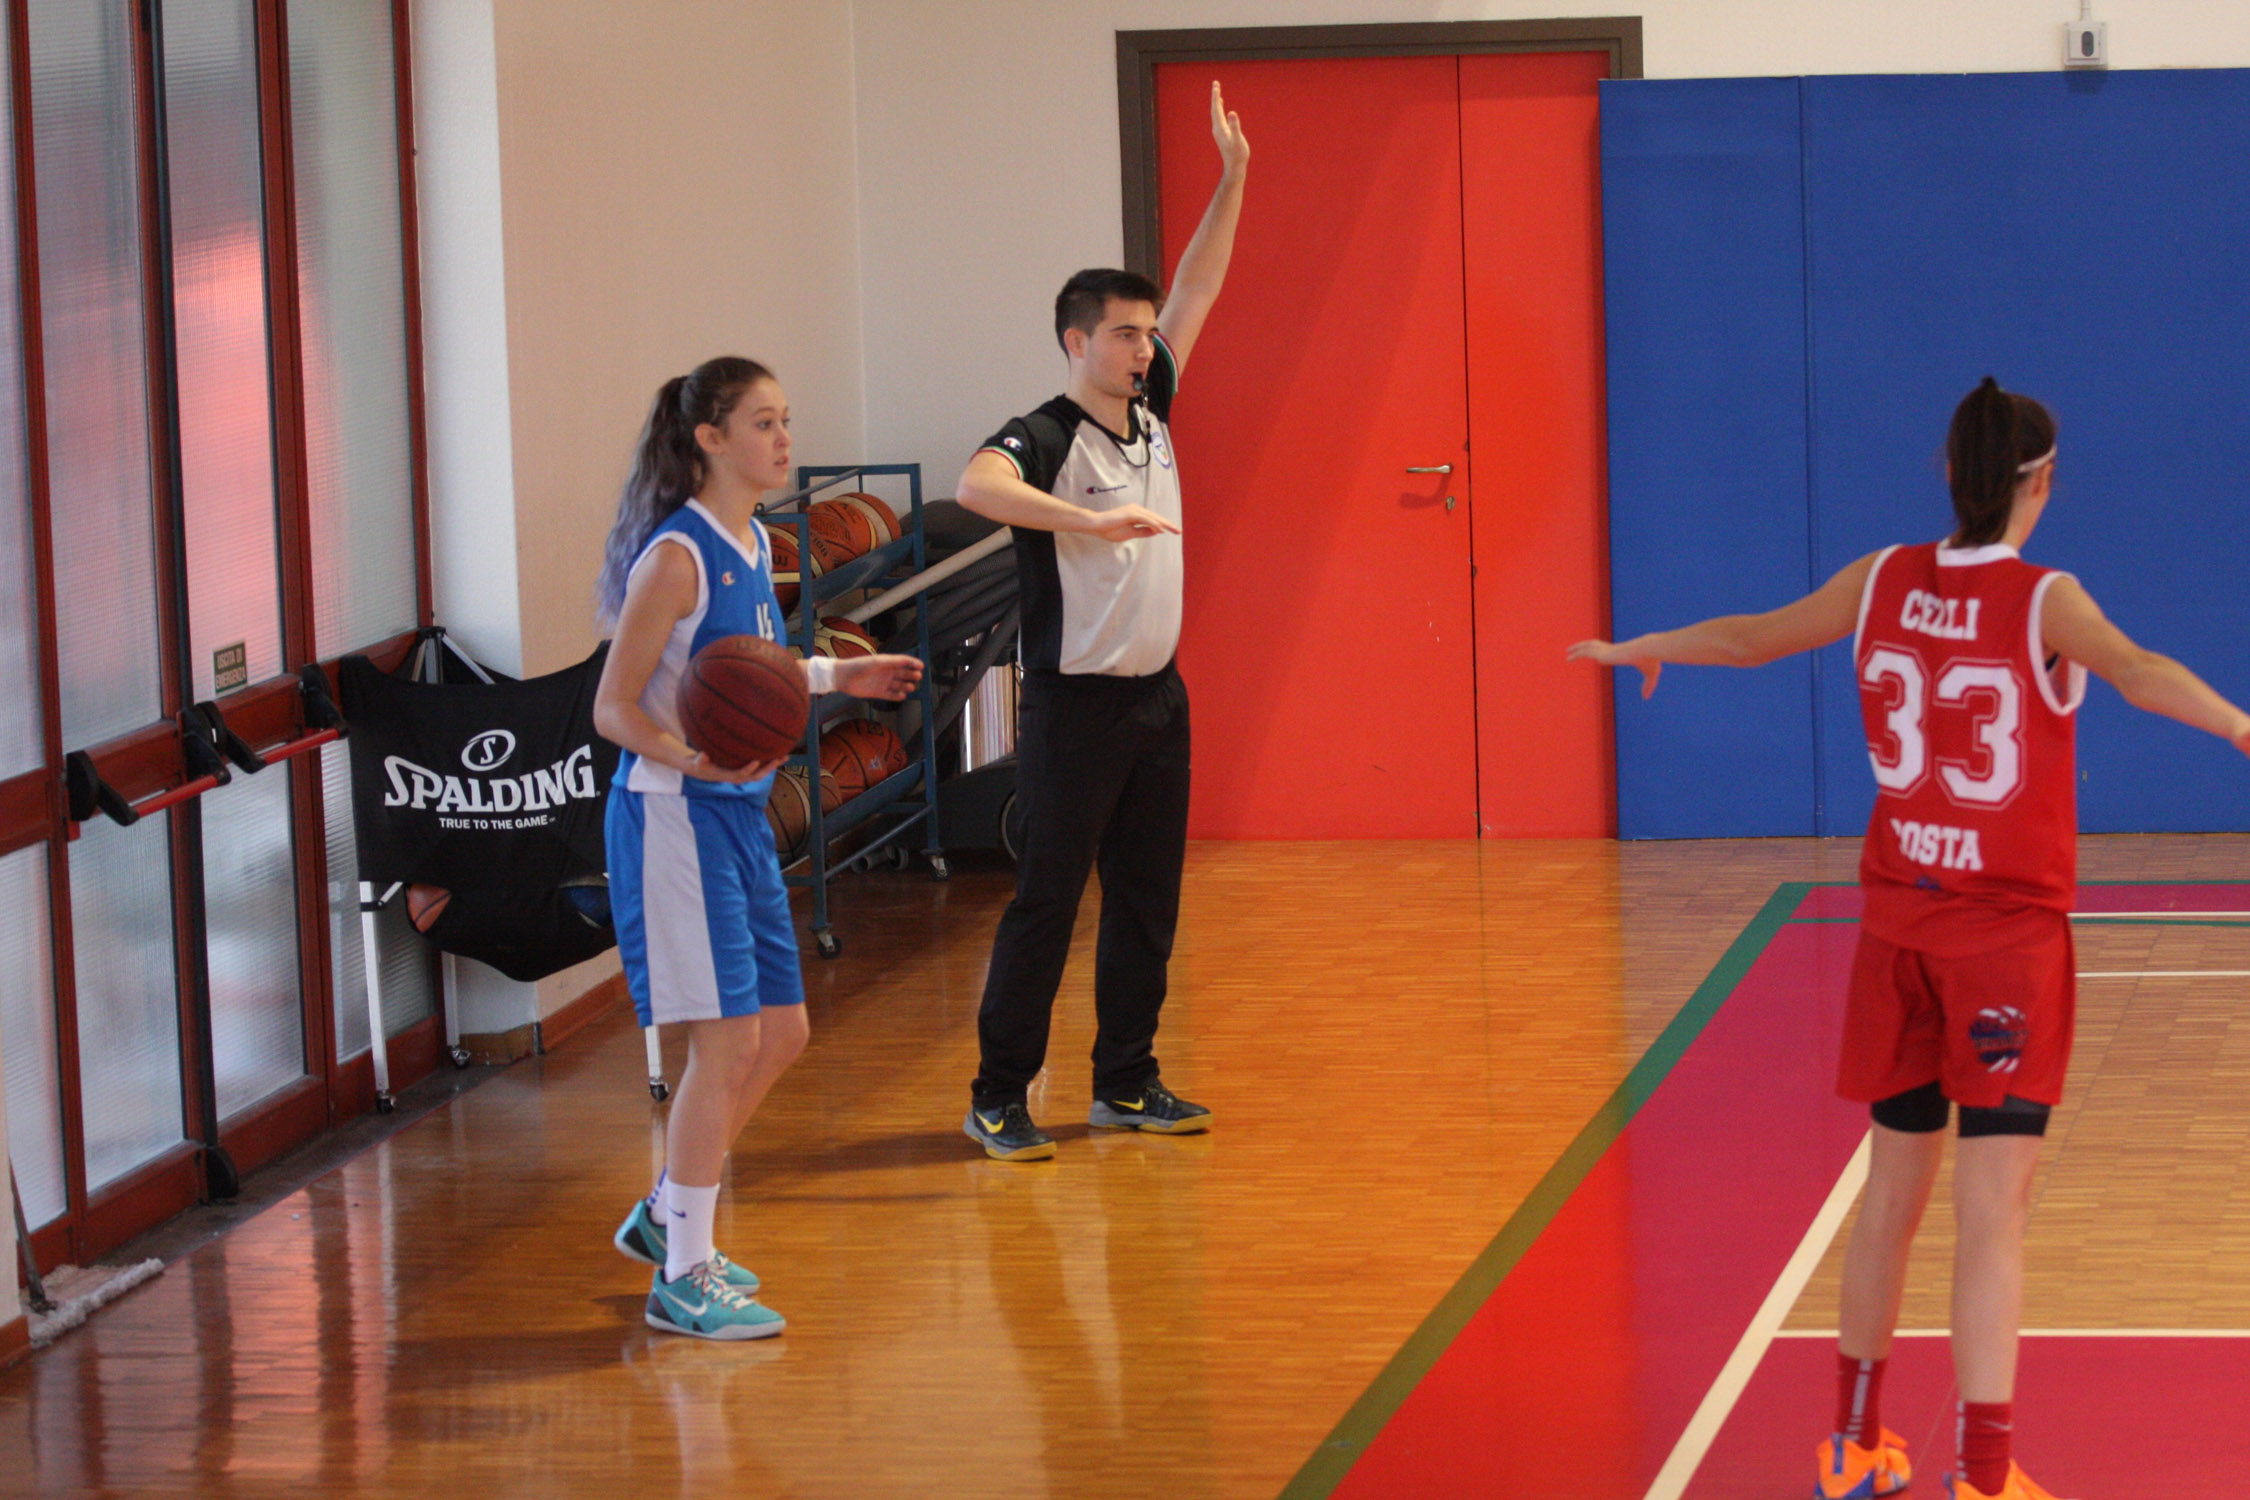 U16E - Costa Masnaga vs Baskettiamo Vittuone 2001 00022.jpg